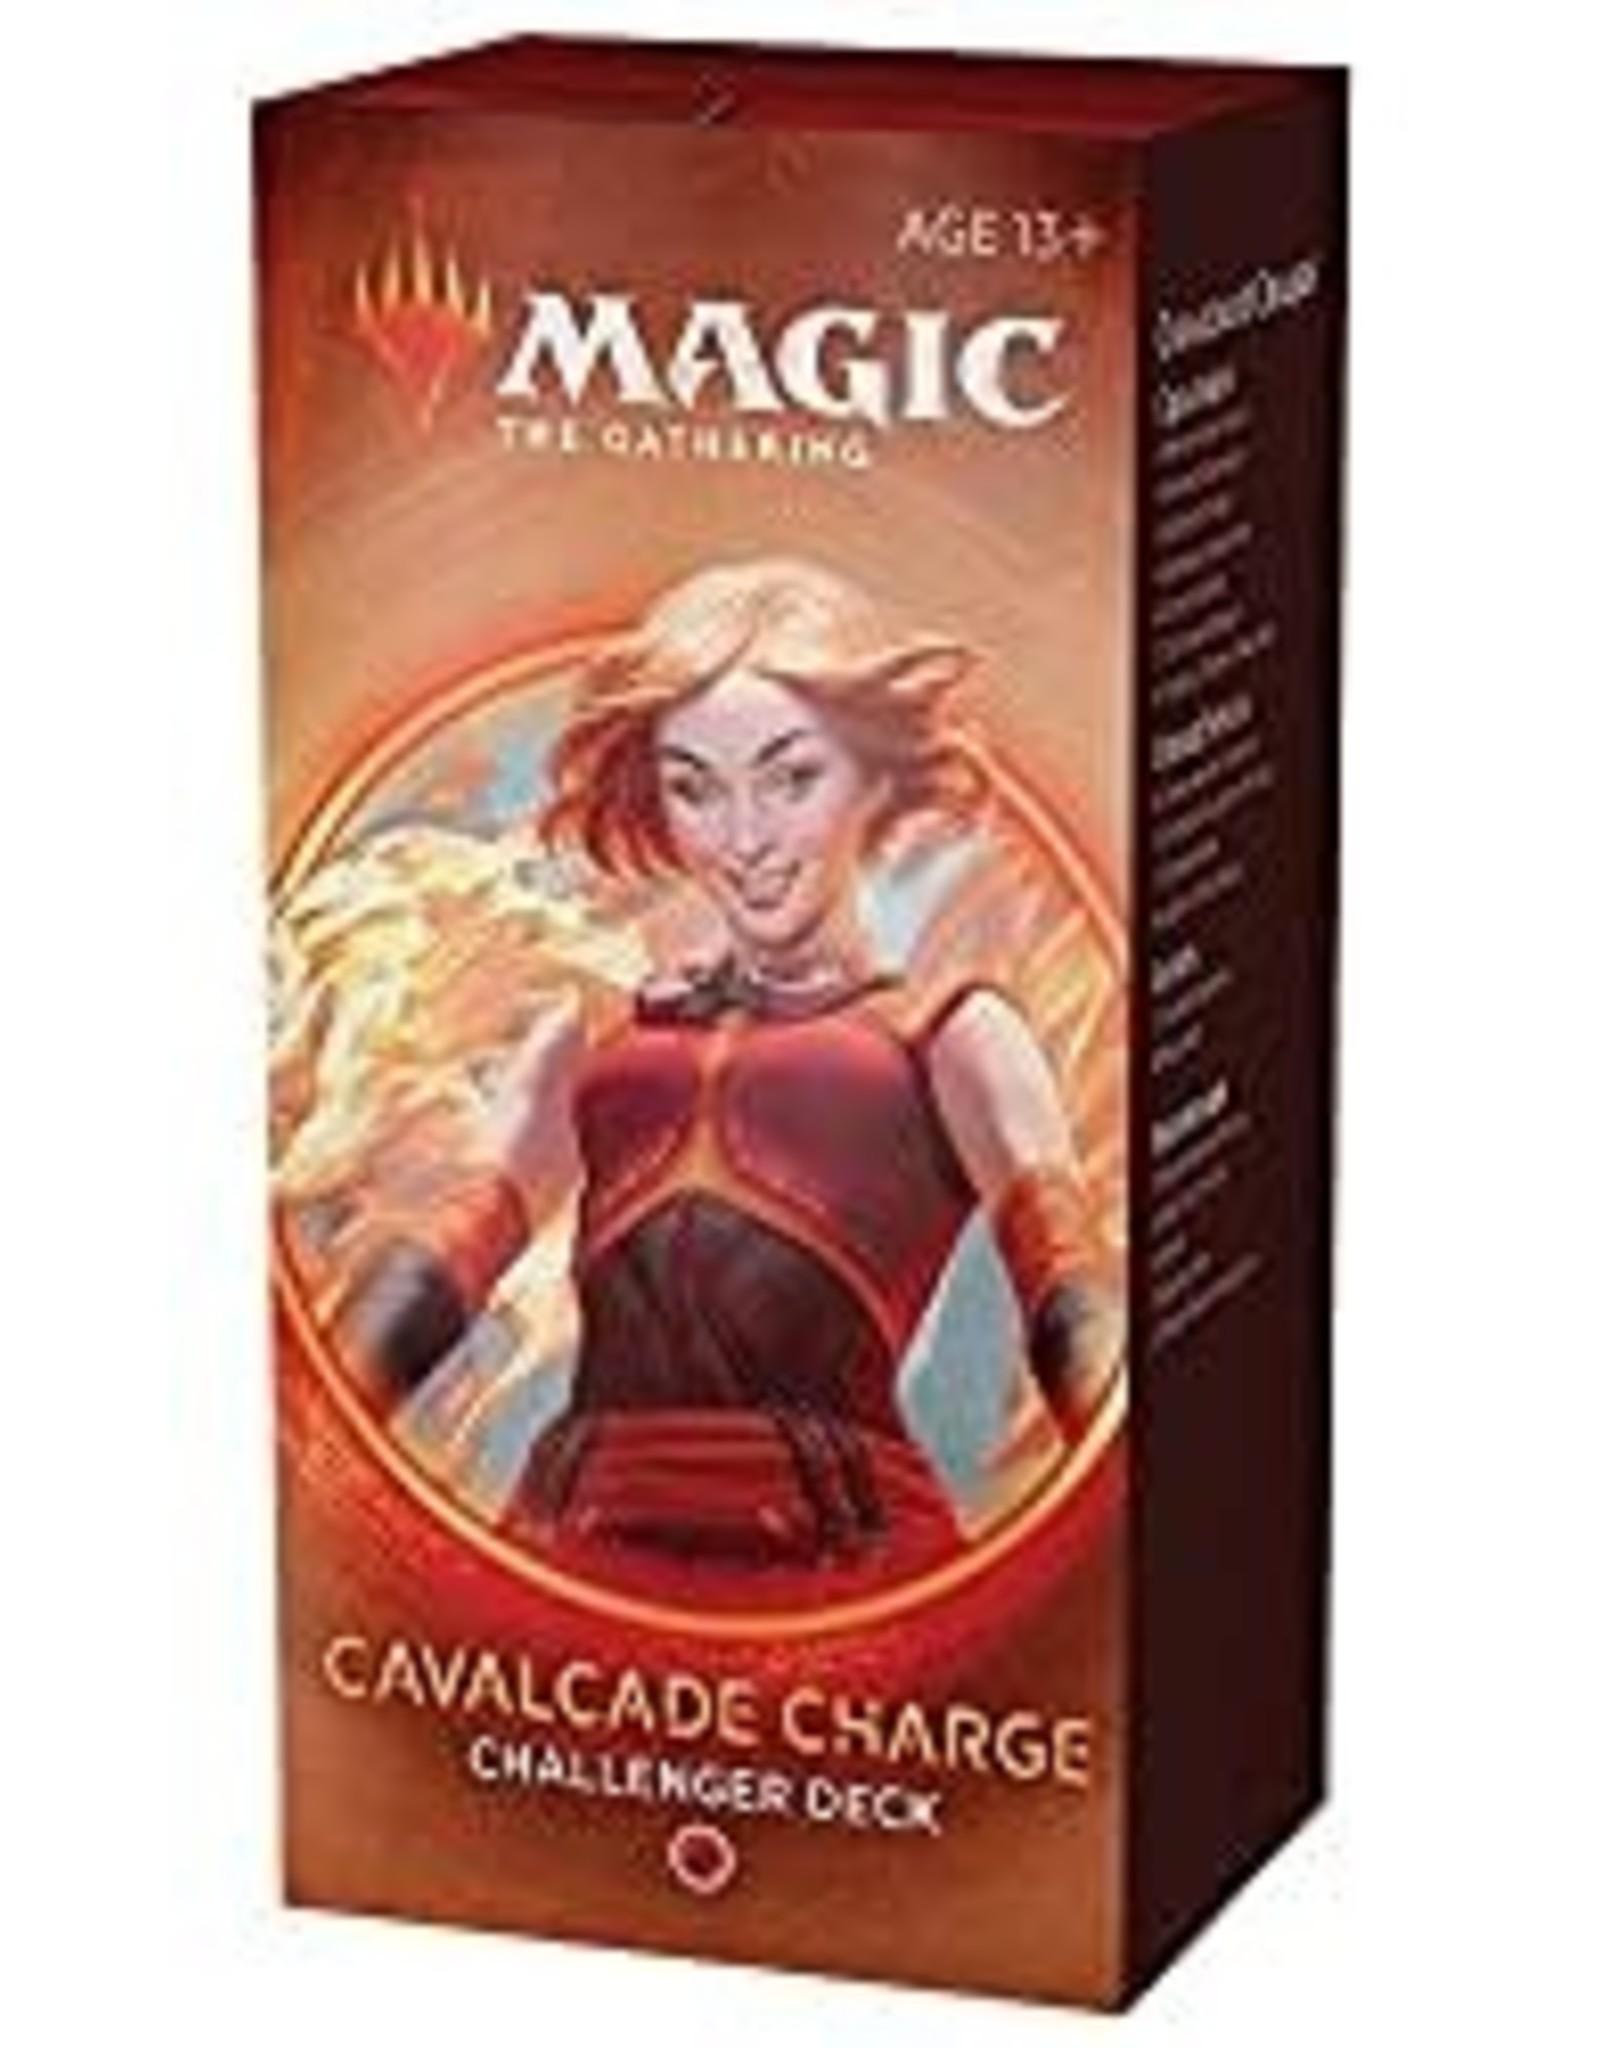 MTG Challenger Deck: Cavalcade Charge